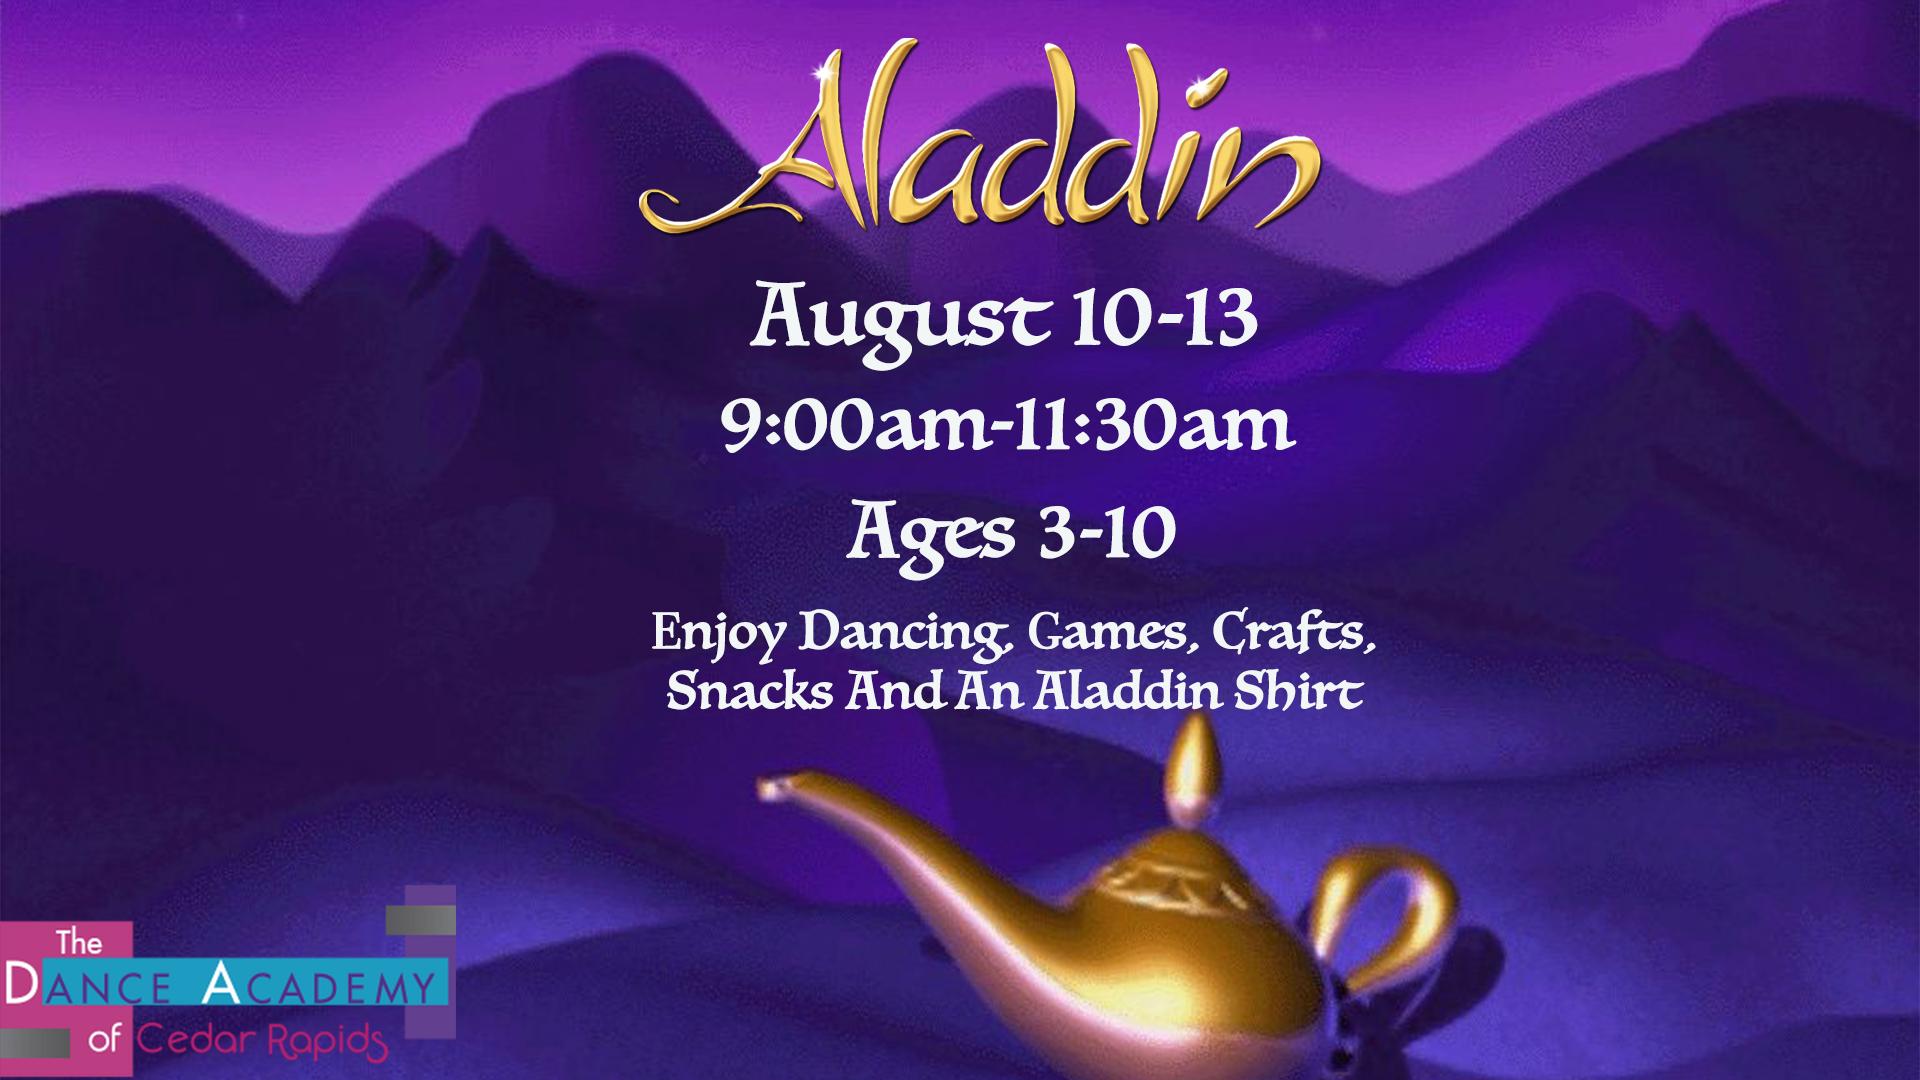 Aladdin Event Ad FINAL.tif